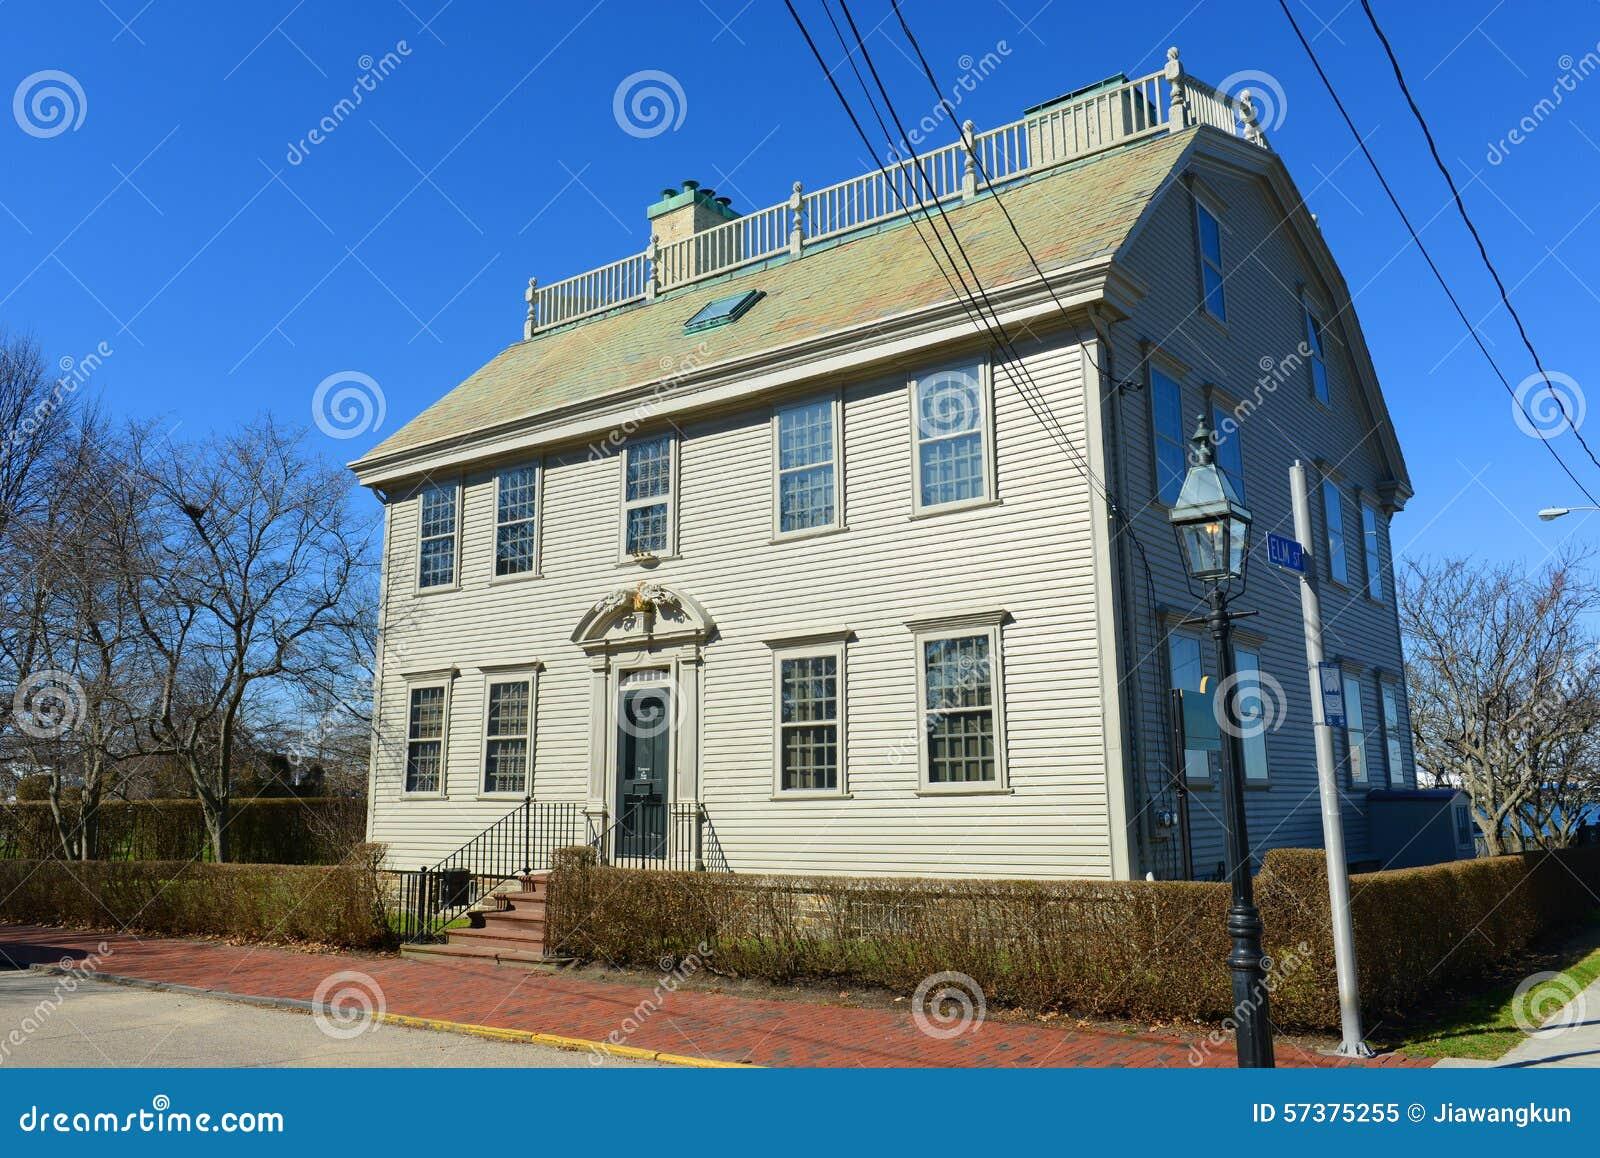 Hunter house rhode island usa stock photo image 57375255 - The home hunter ...